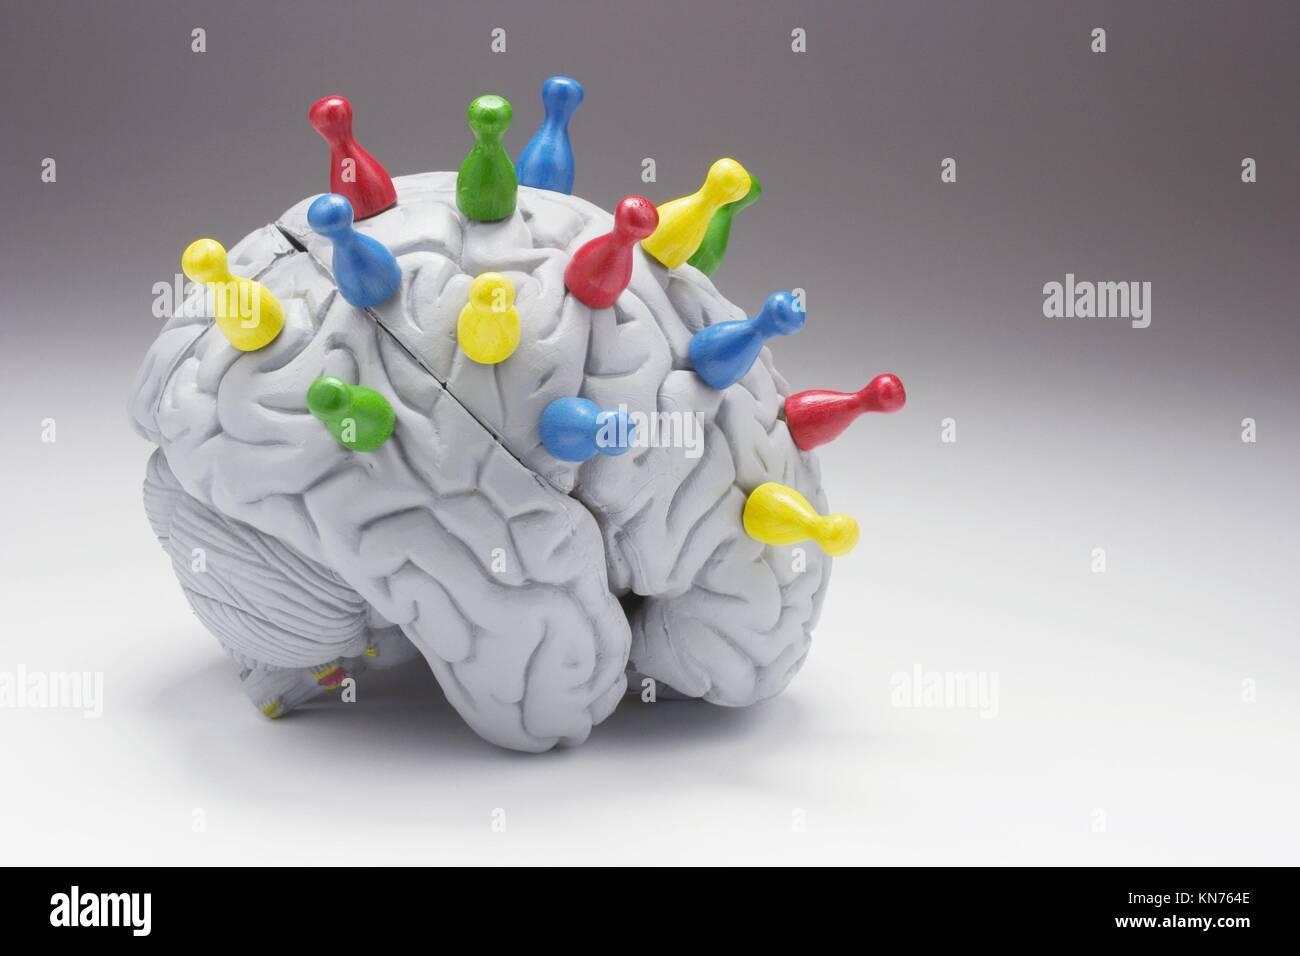 Game Pieces on Anatomy Model of Human Brain Stock Photo: 167959582 ...